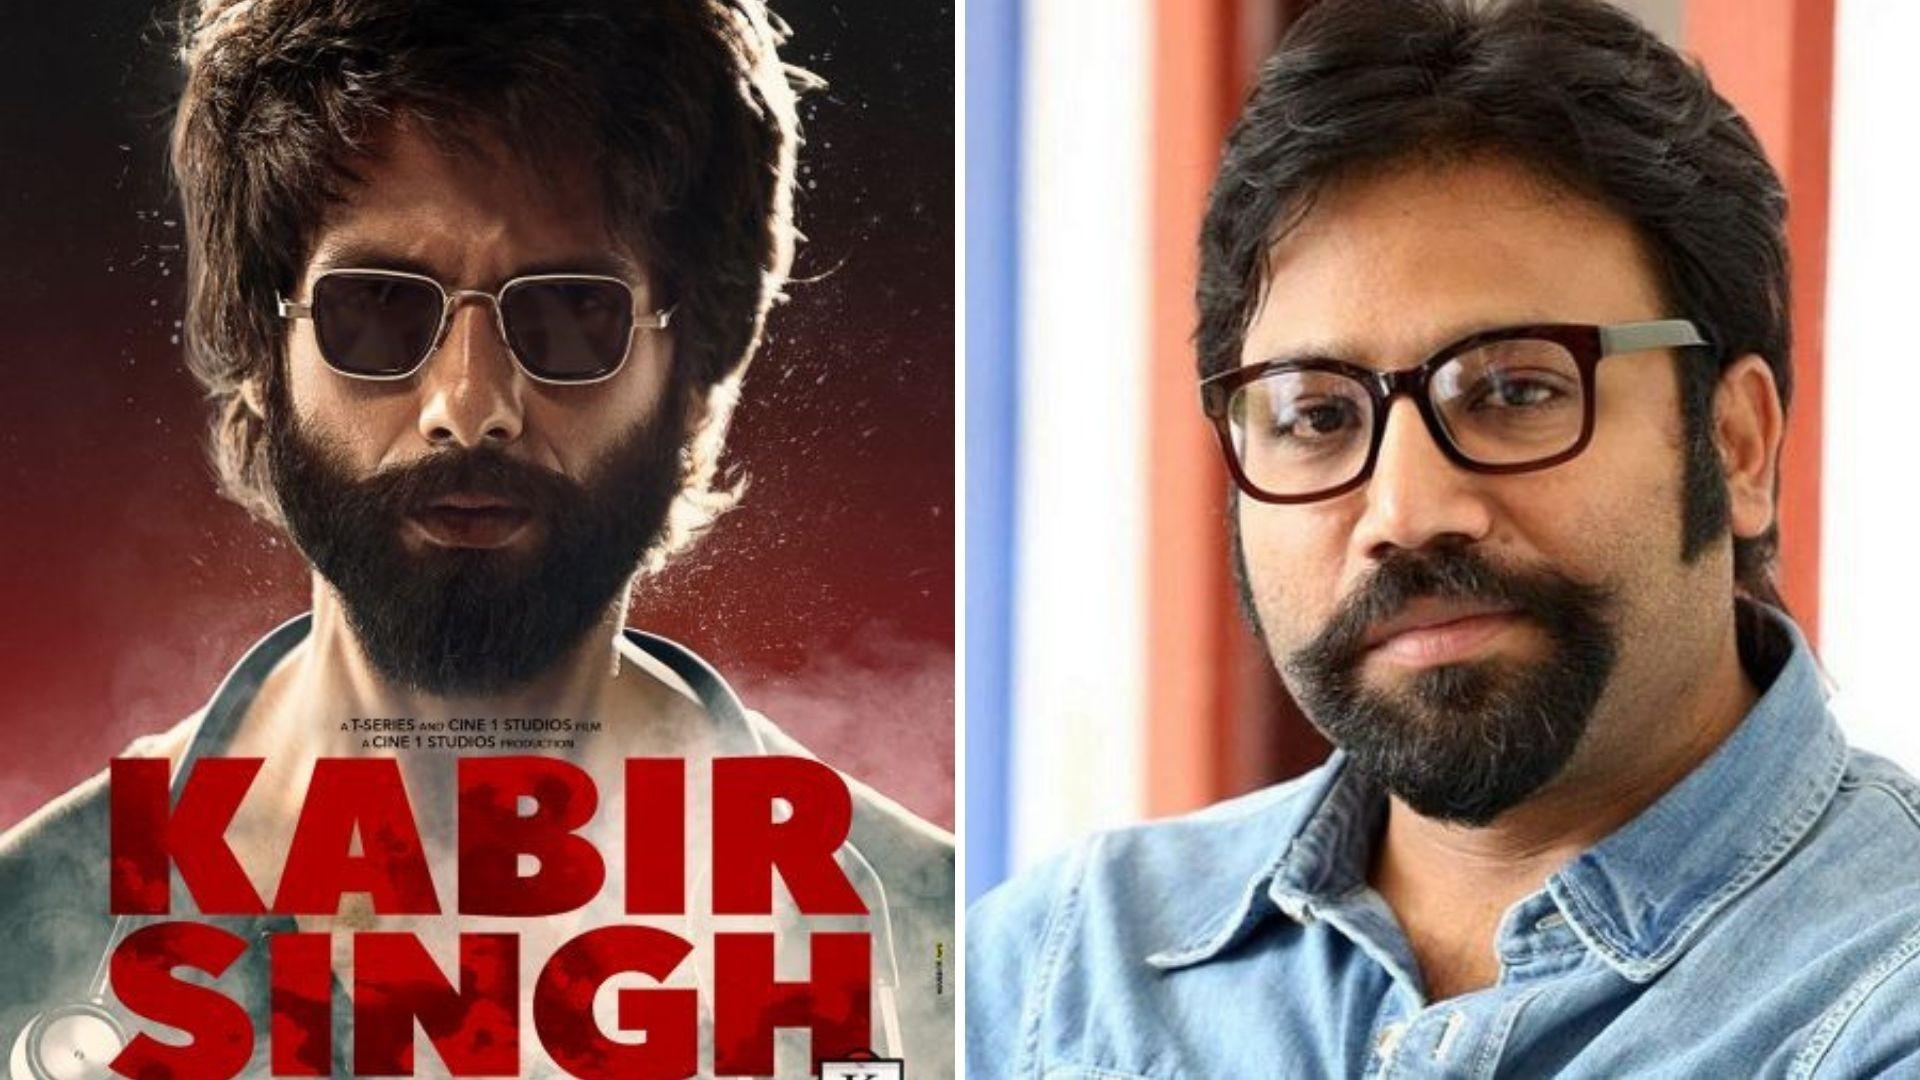 'Kabir Singh' Director Slammed for Regressive Views on Love